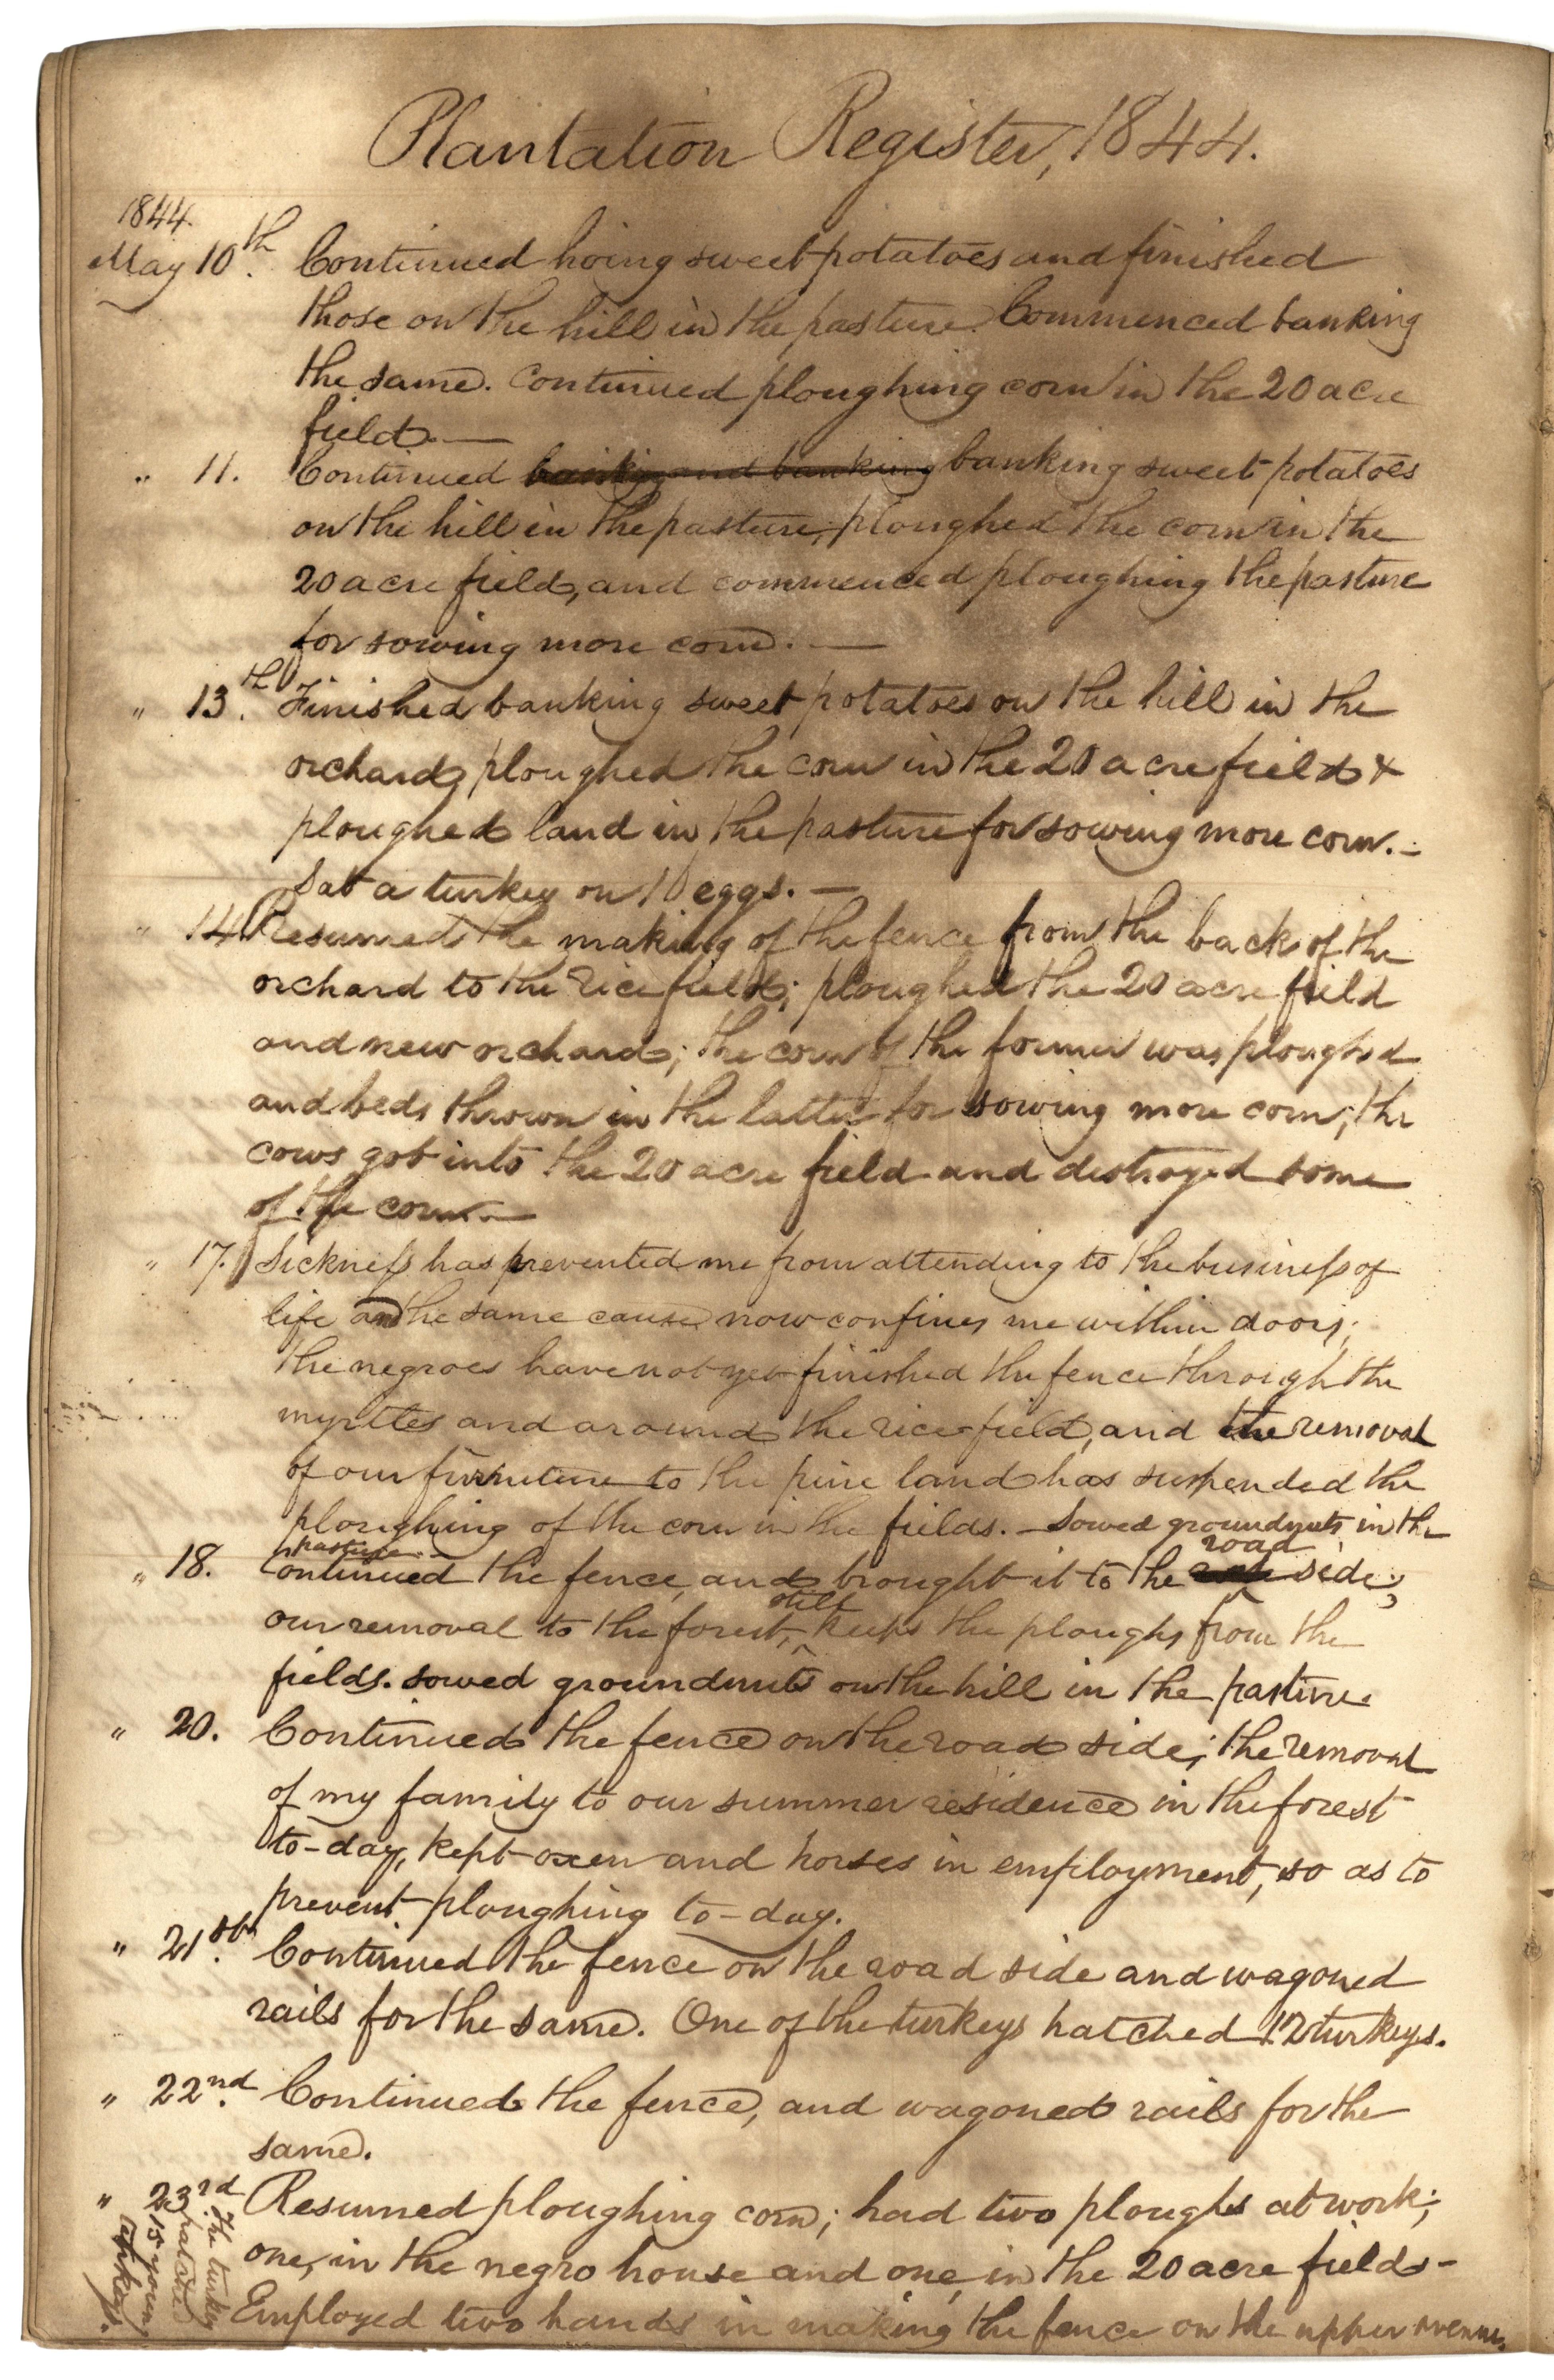 Gibbs Plantation Register, Page 102